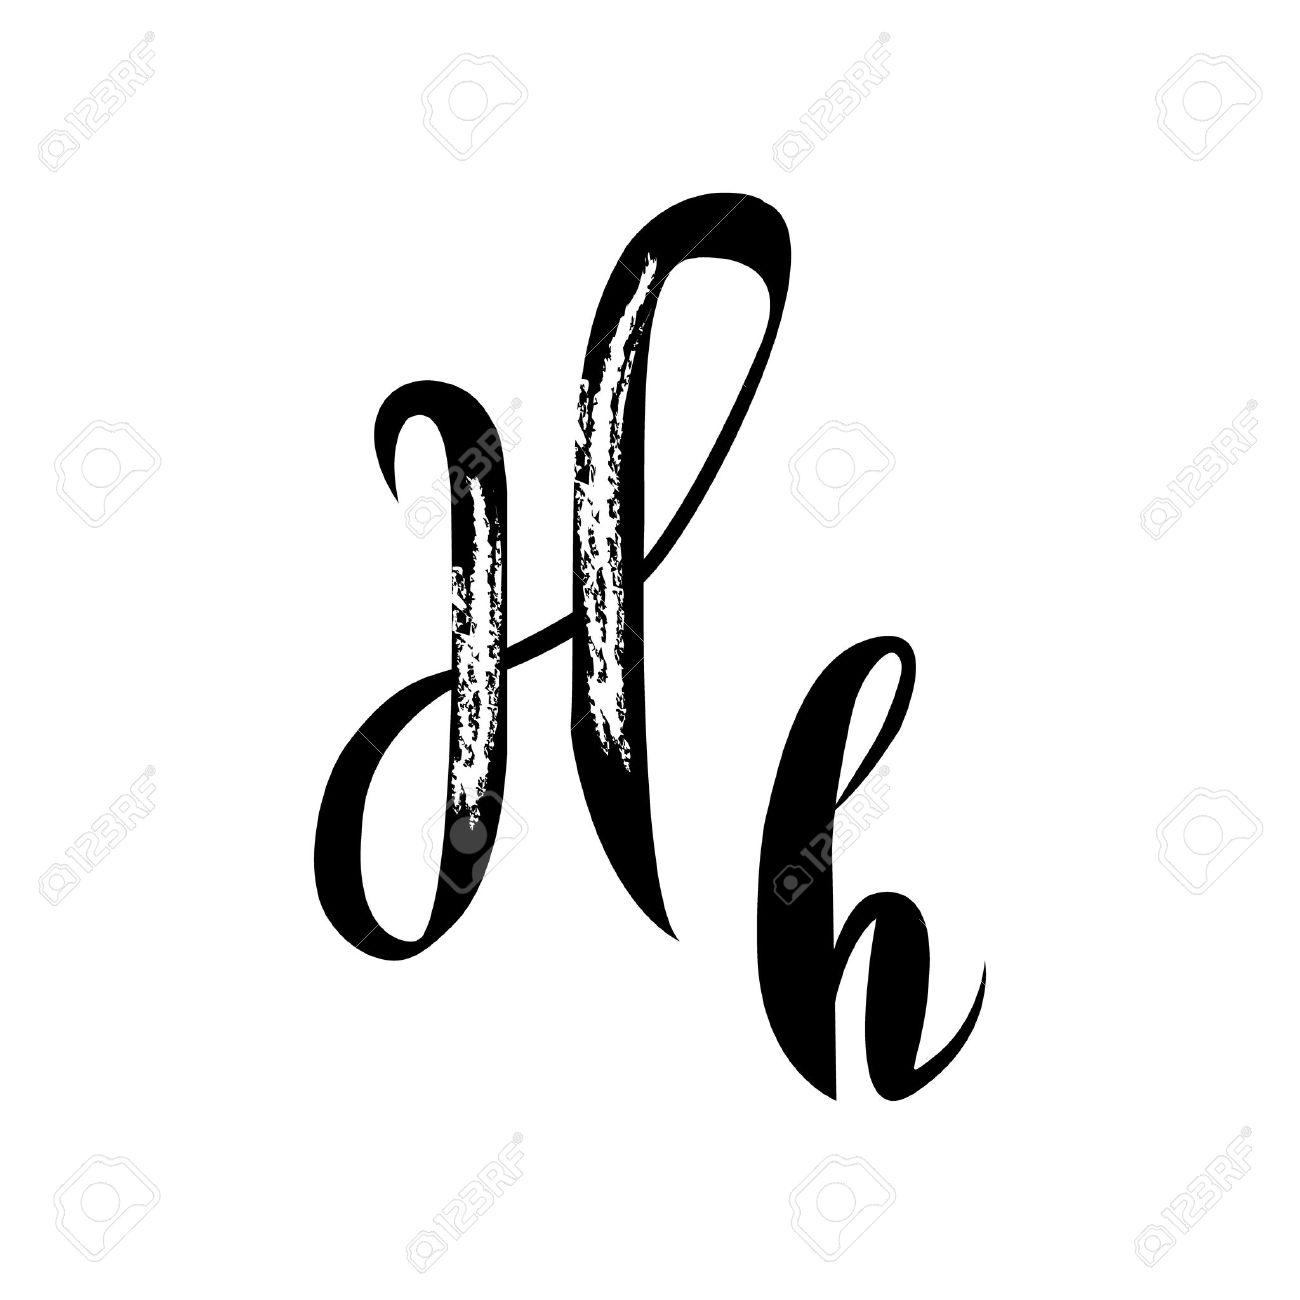 Letter H Alphabet Lettering Vector Calligraphy Manuscript Recipe Stock